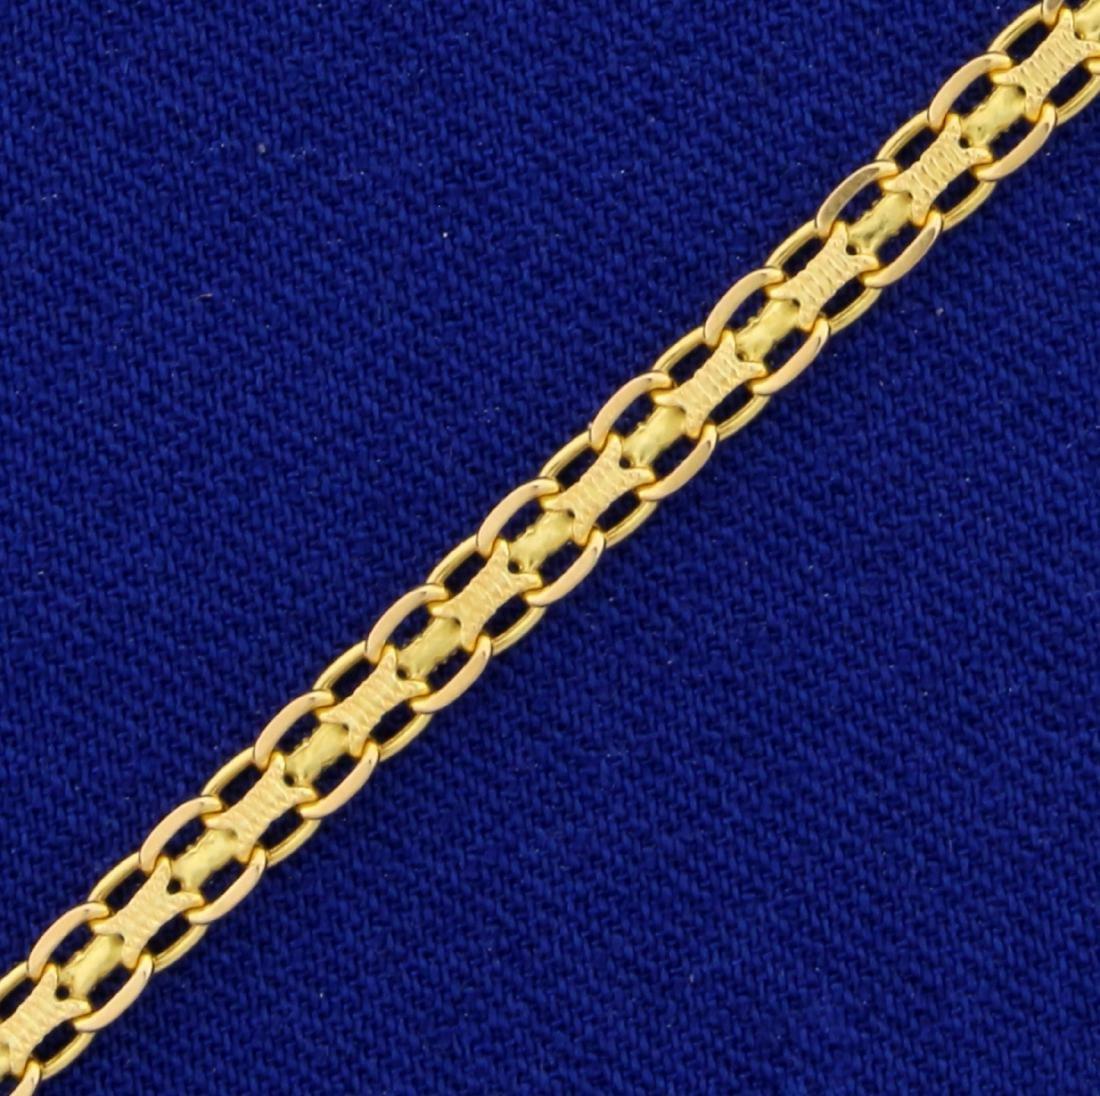 7 1/2 Inch Bismarck Link Bracelet in 14K Yellow Gold - 2